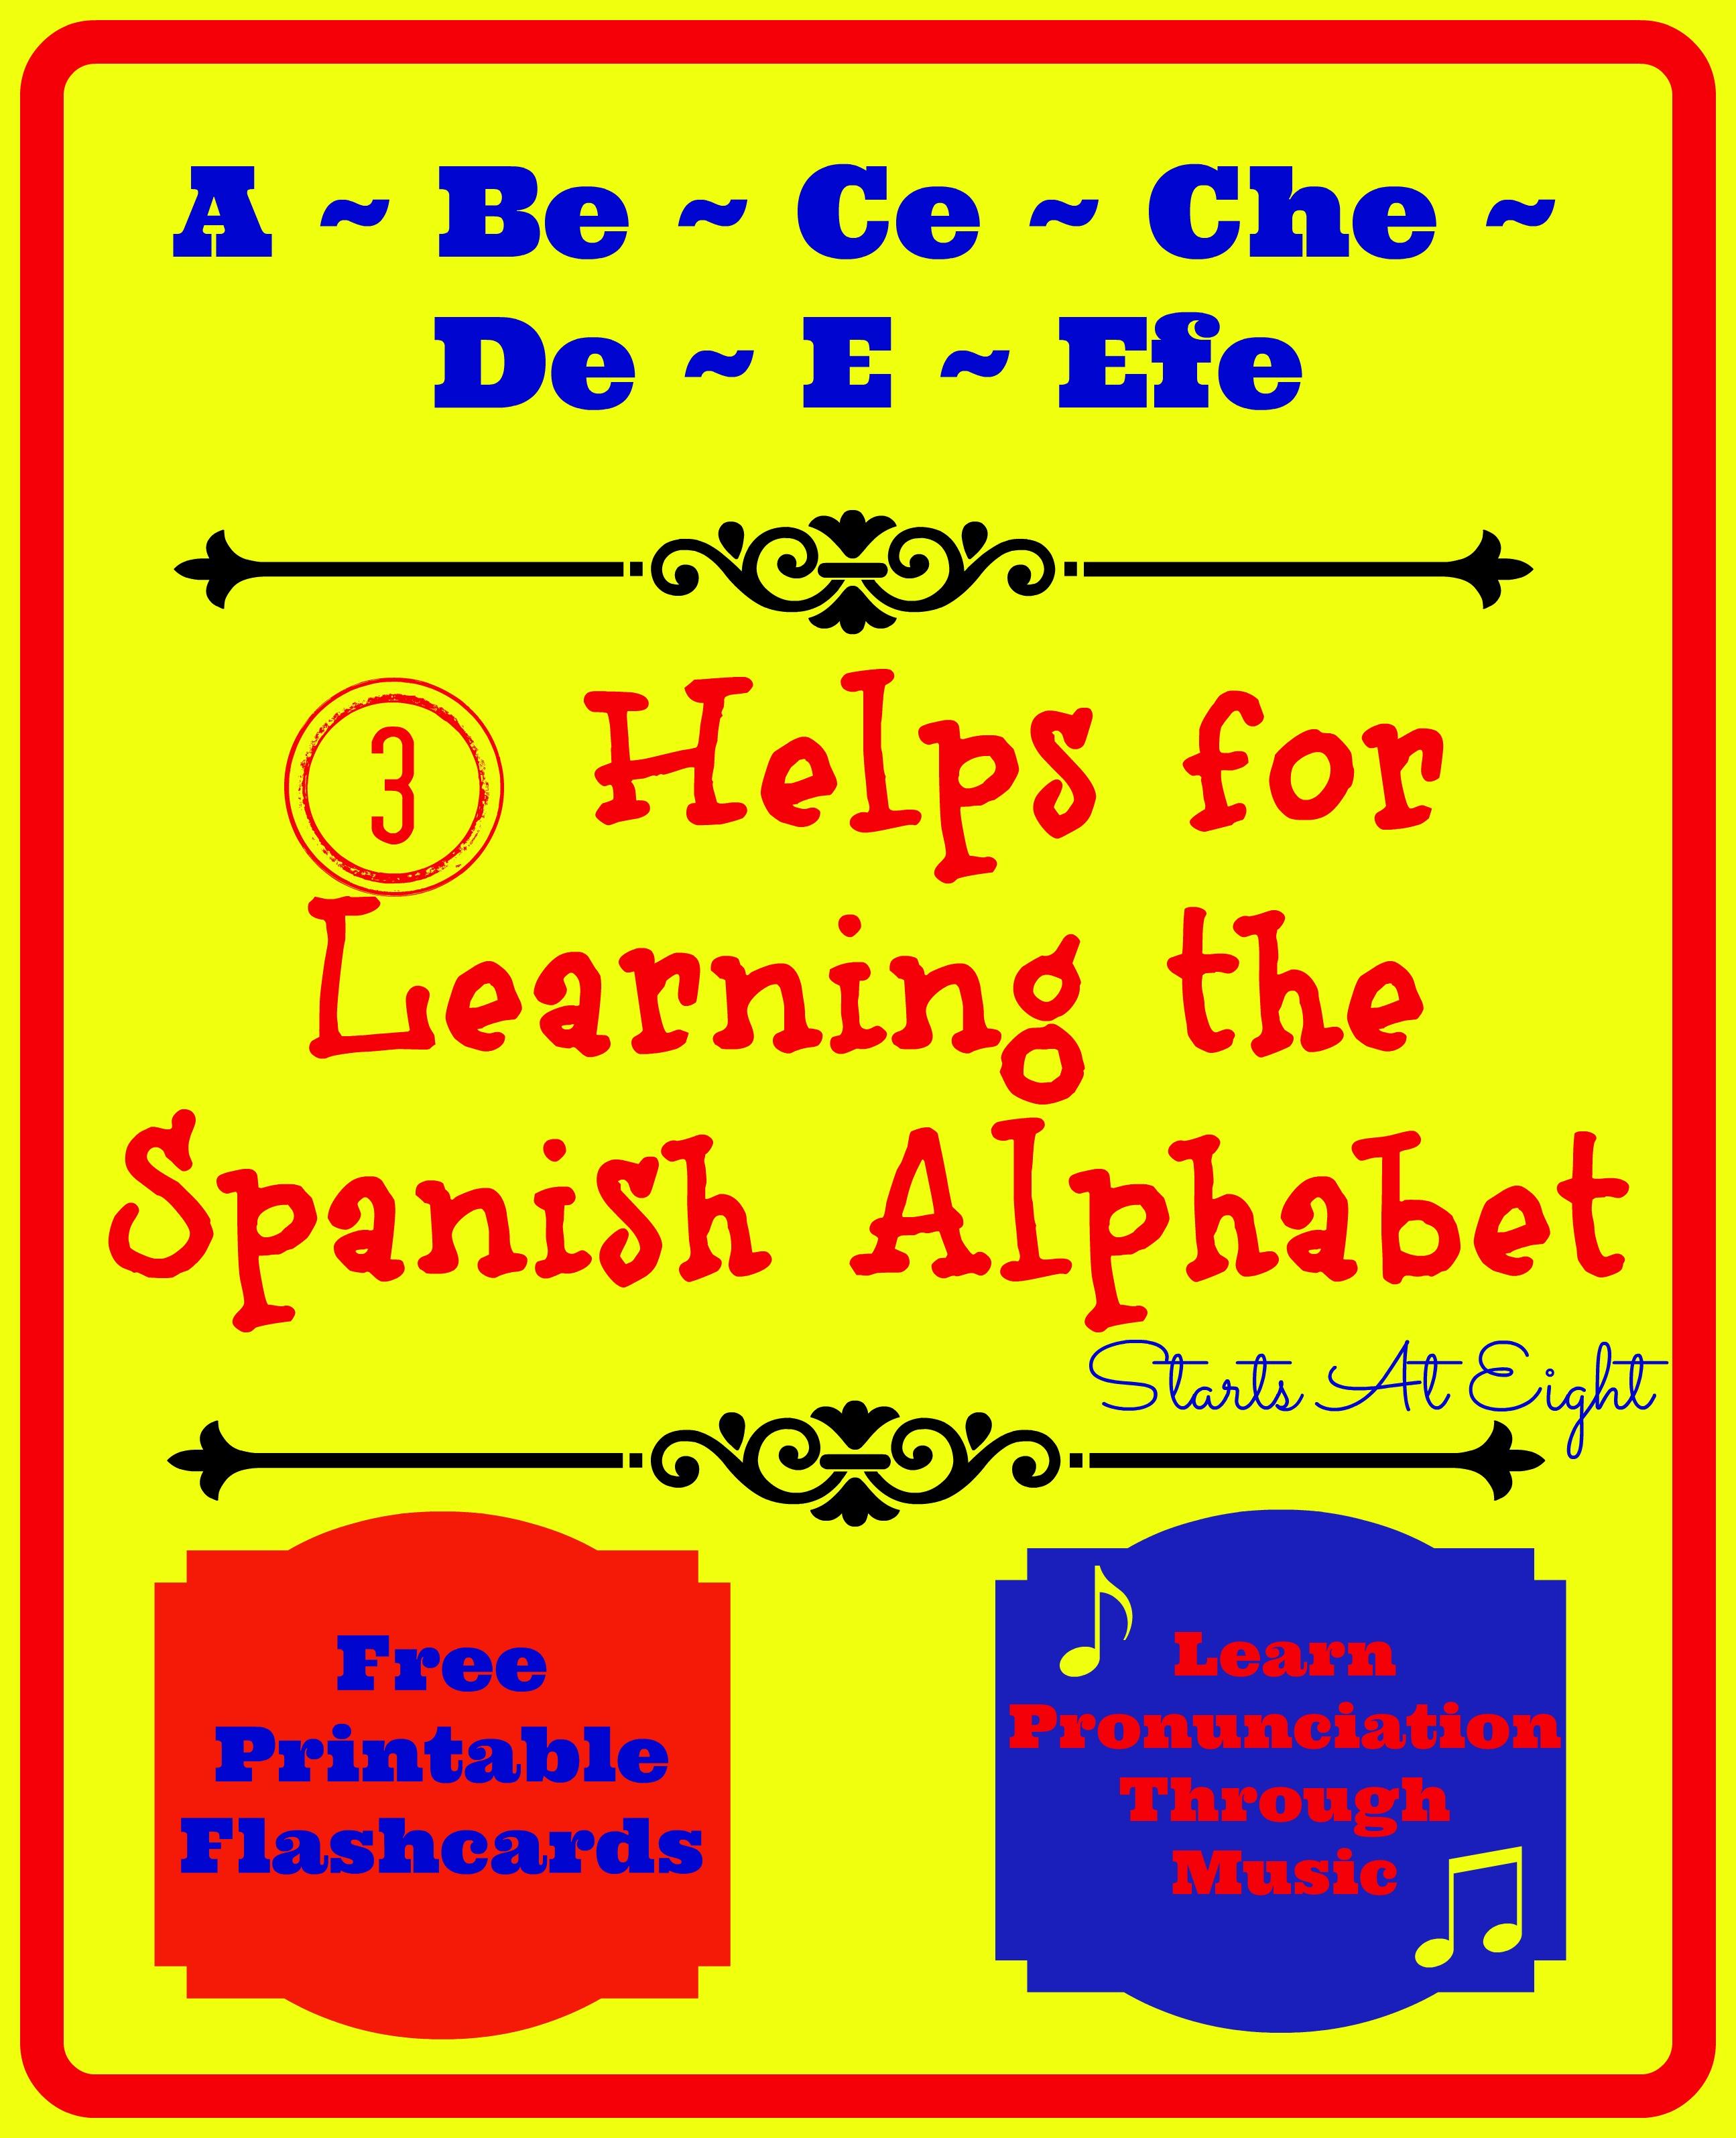 Spanish Alphabet Flashcards Free Printable